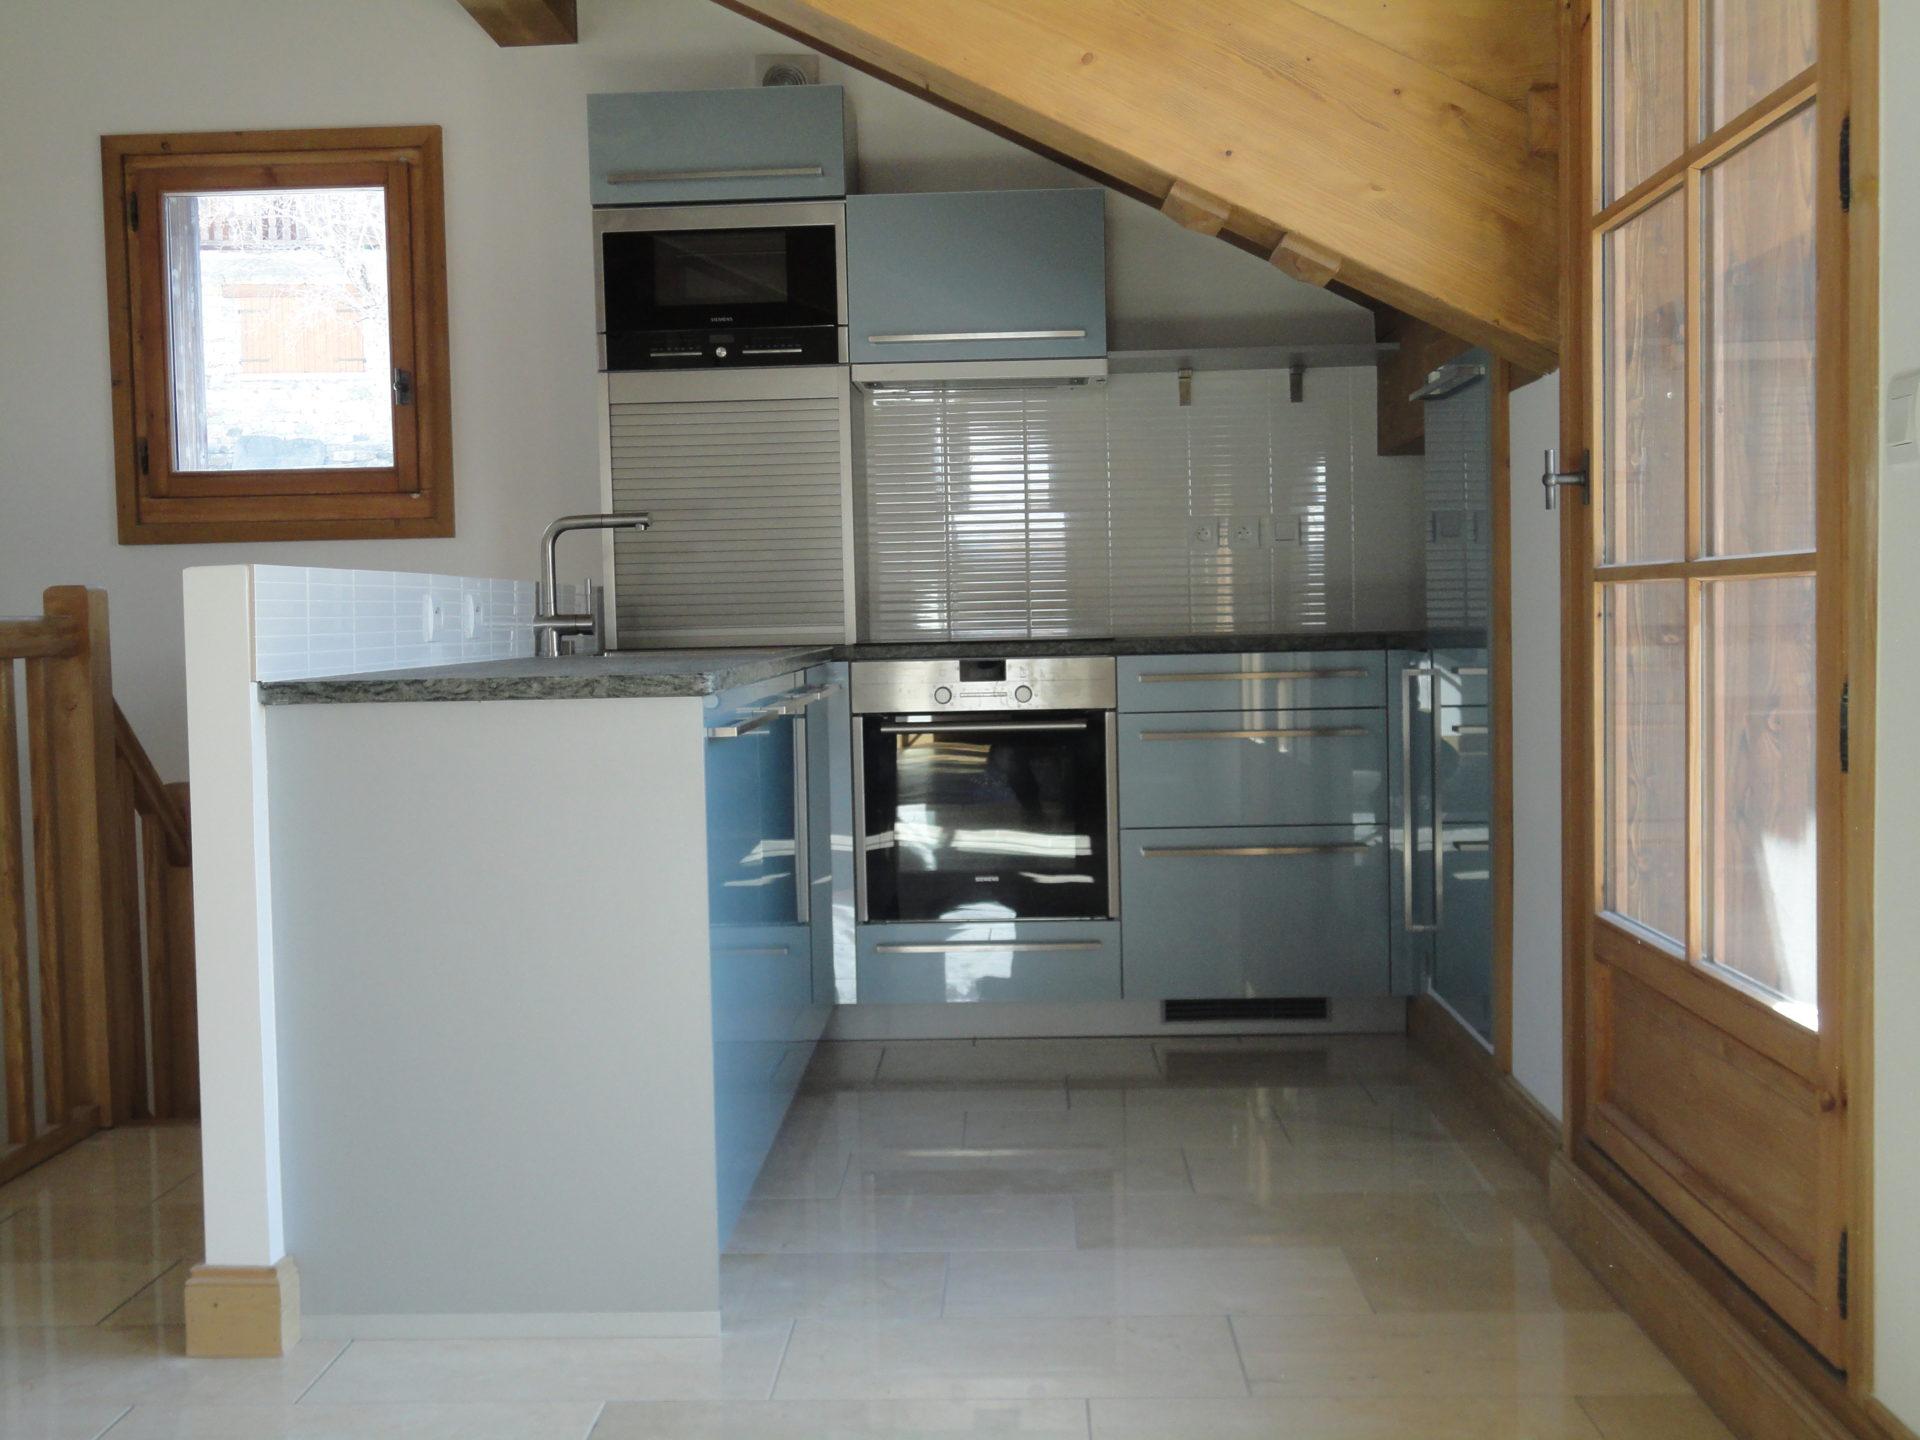 Chalets Nant Giraud II - Appartement I - Saint Martin de Belleville Savoie France